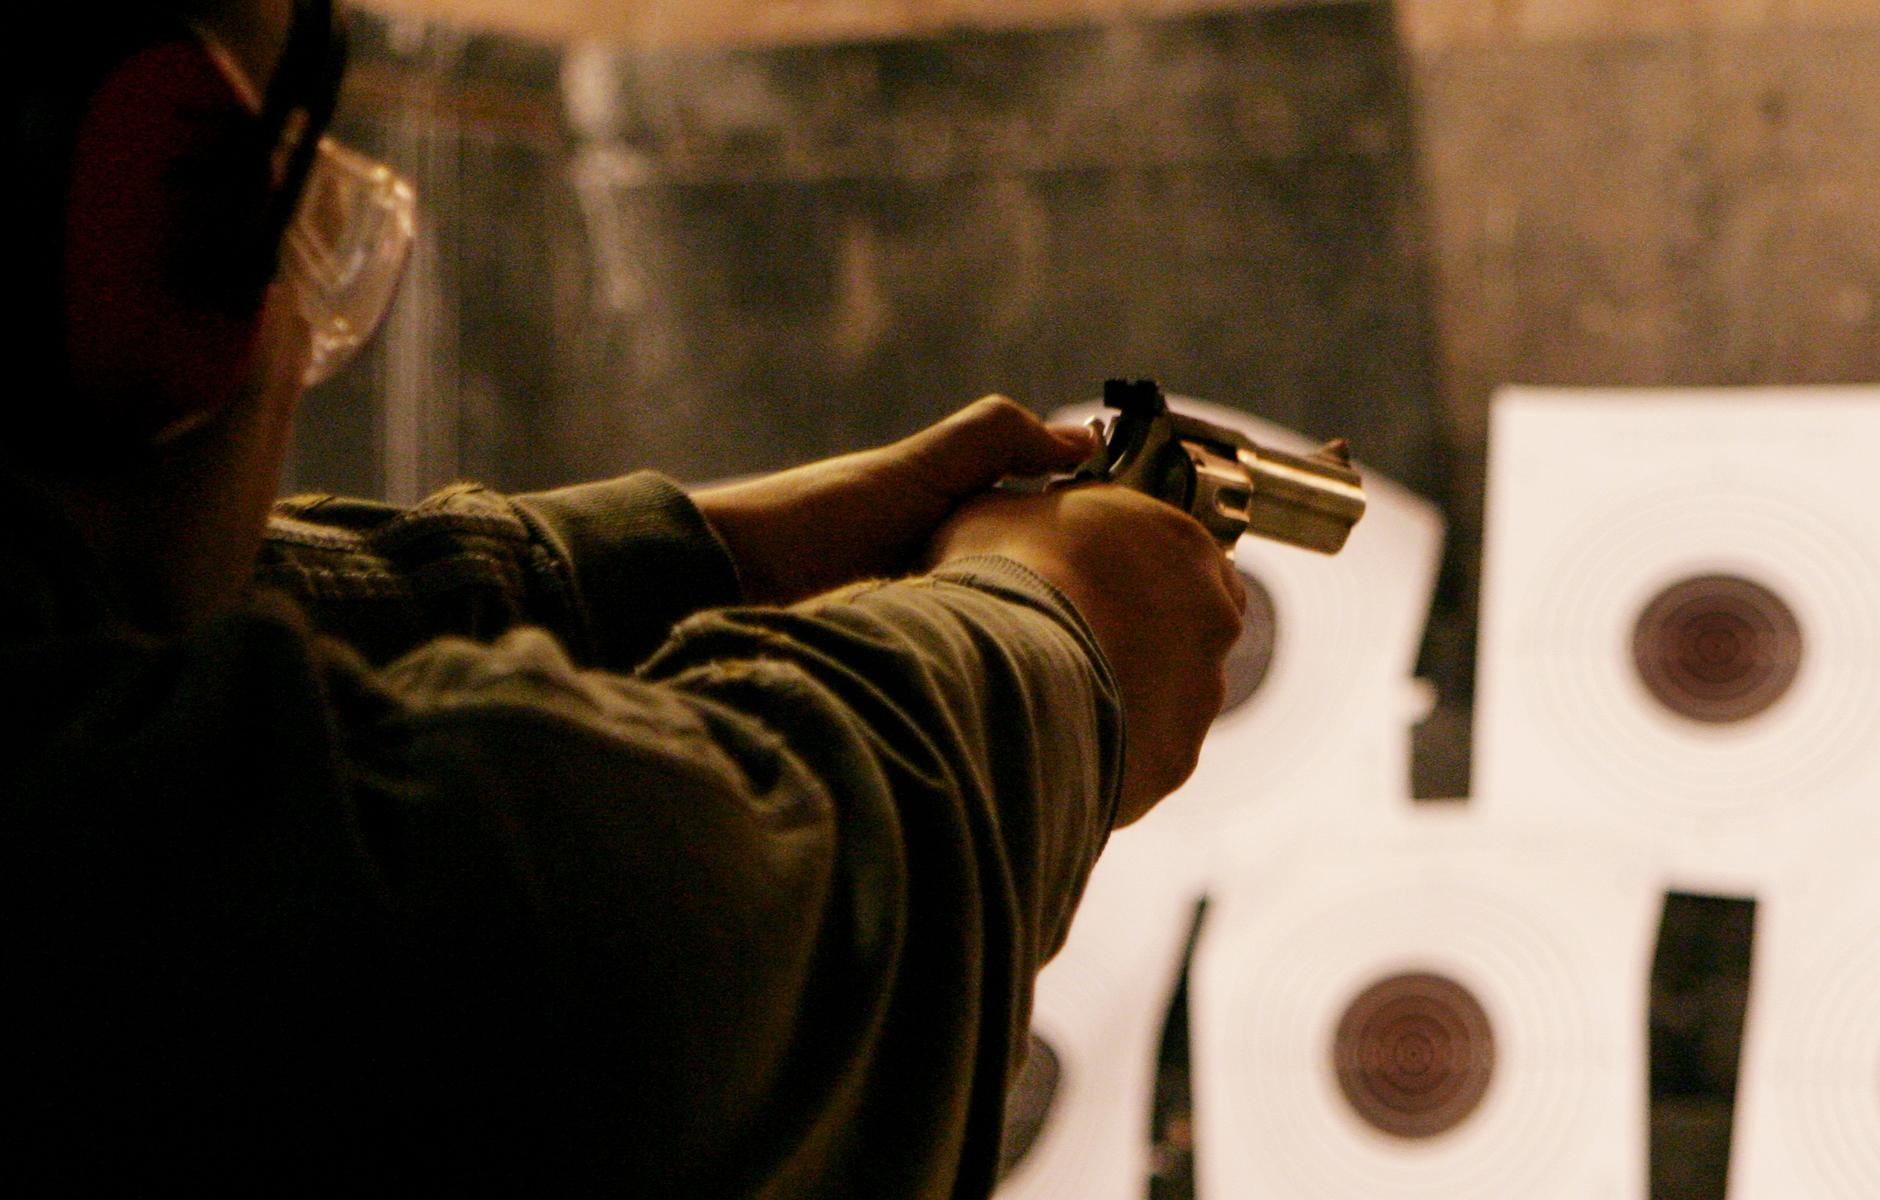 Shooting tir 51 rounds ak47 budapest enterrement vie de gar on evg - Que ramener de budapest ...